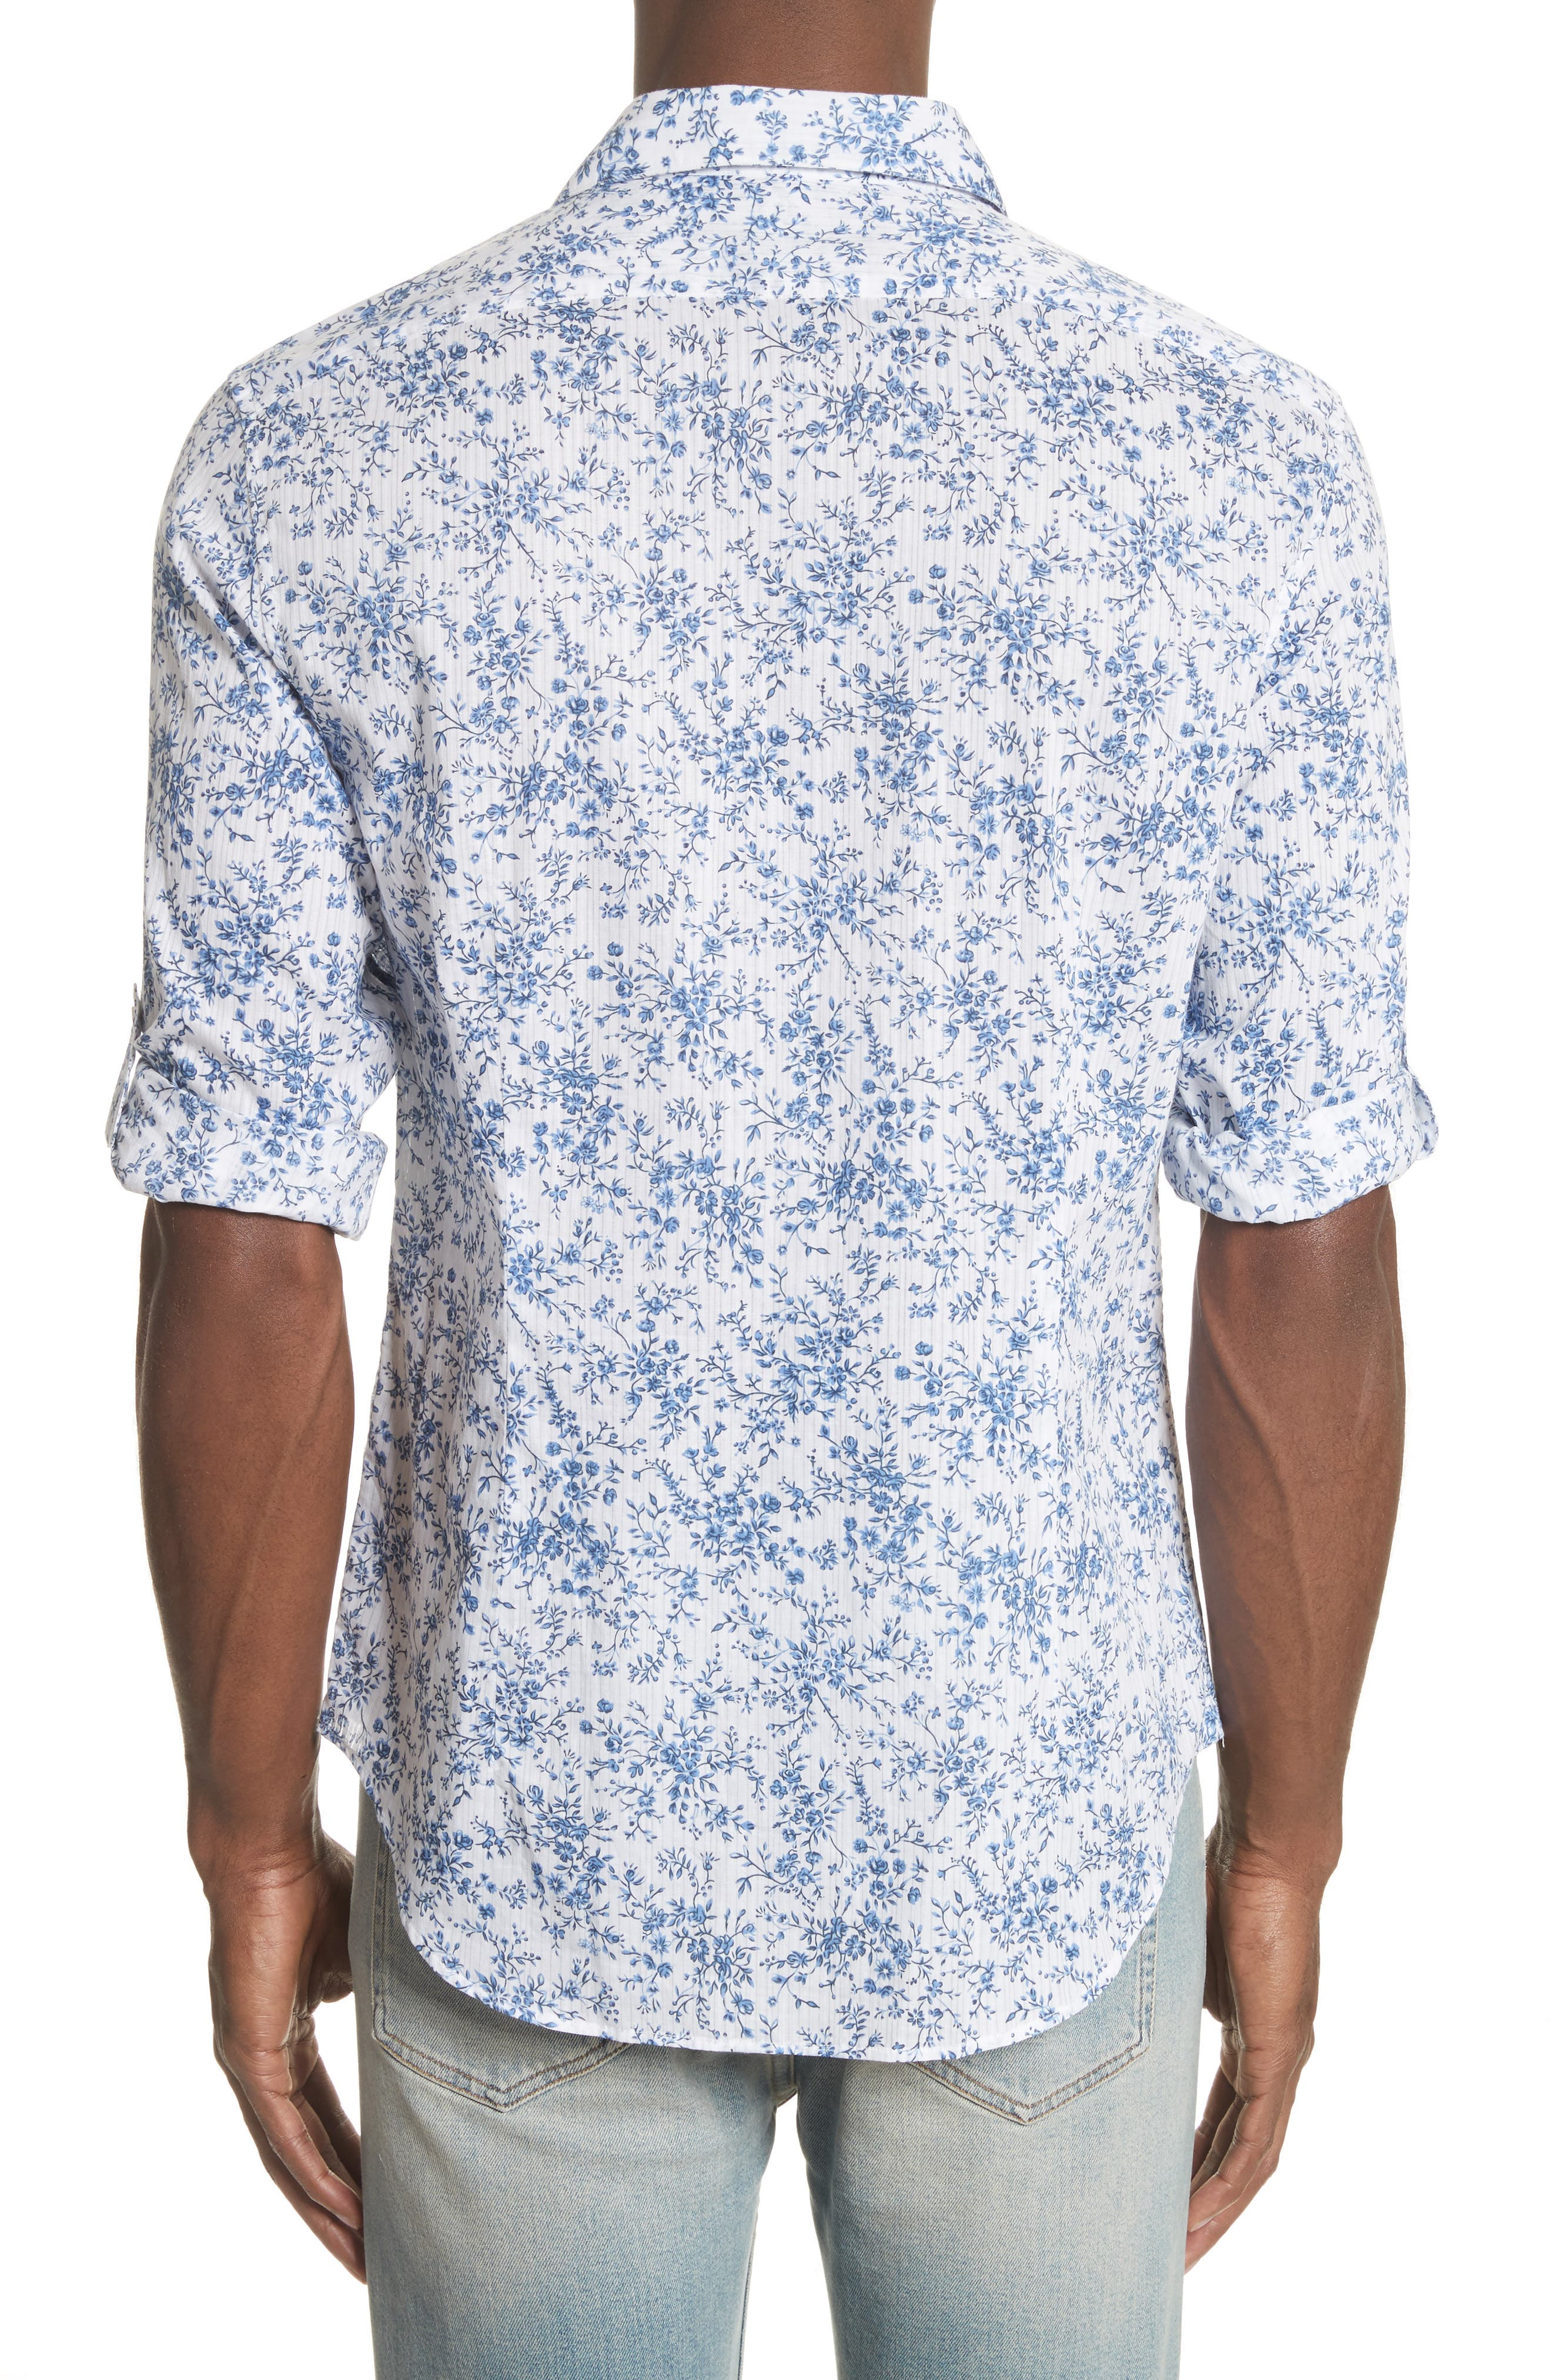 John Varvatos Slim Fit Floral Print Shirt,                             Alternate thumbnail 2, color,                             448